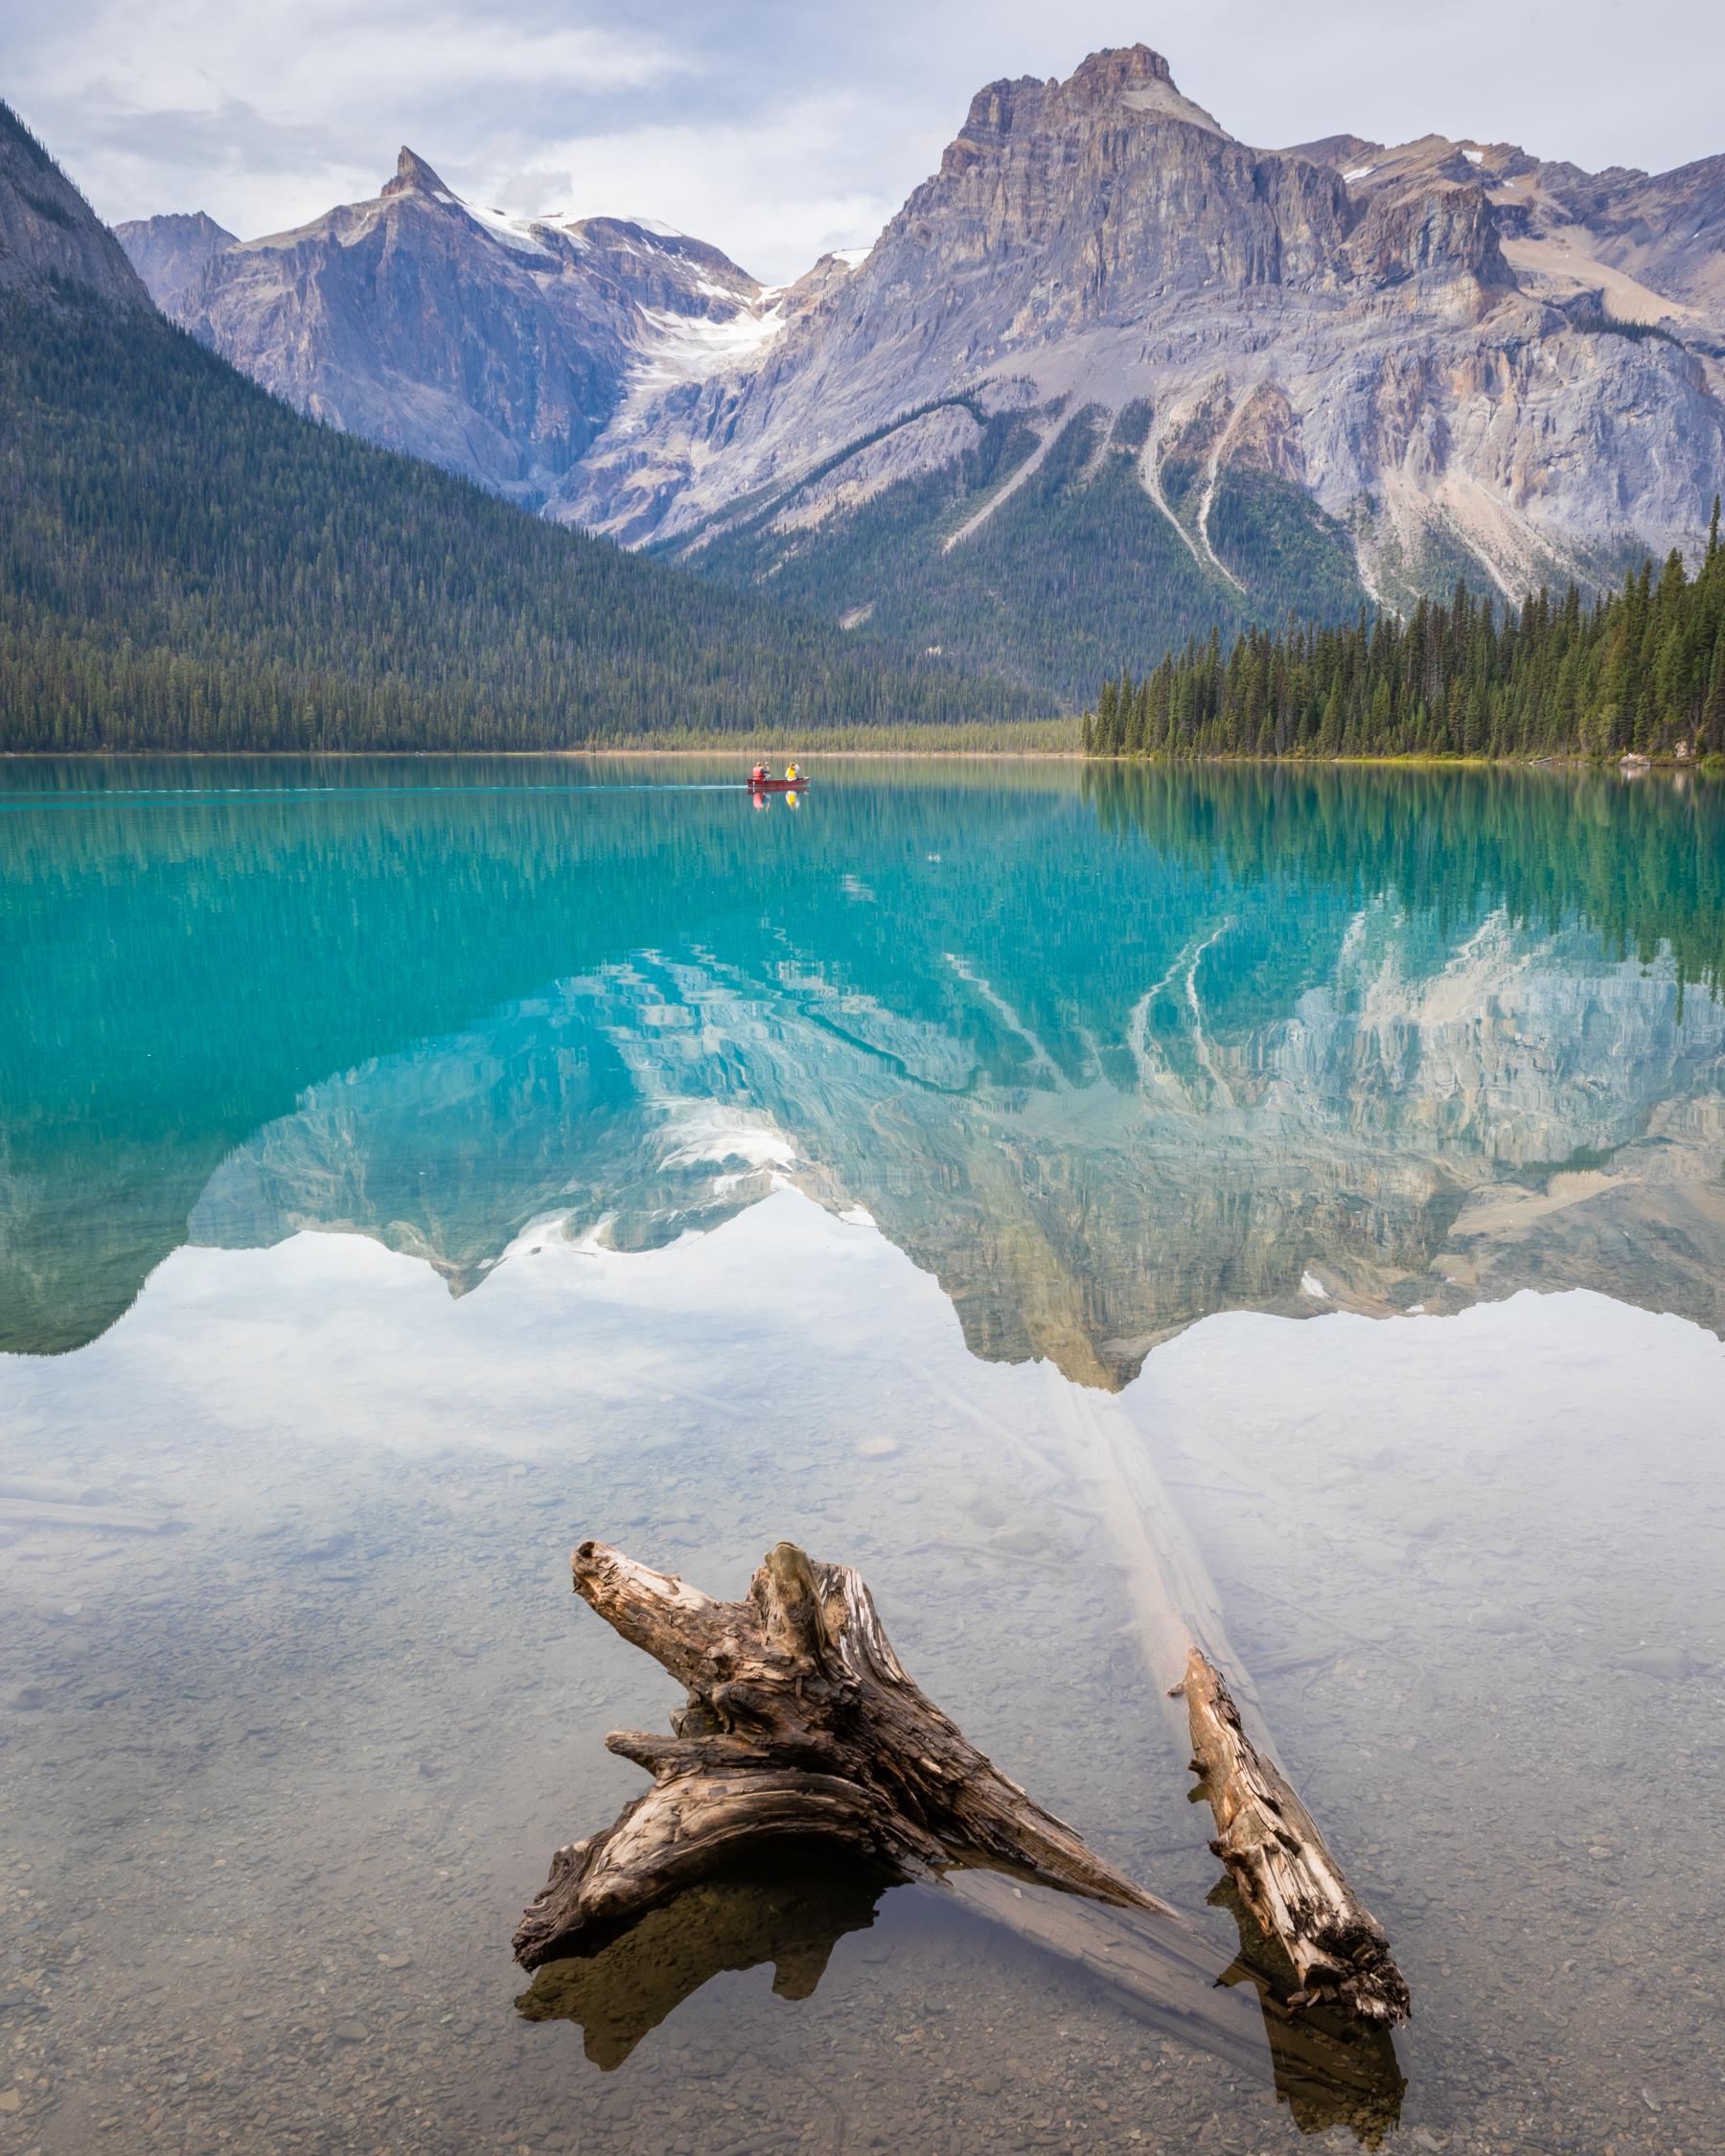 Emerald Lake, Yoho National Park, British Columbia [September, 2019]